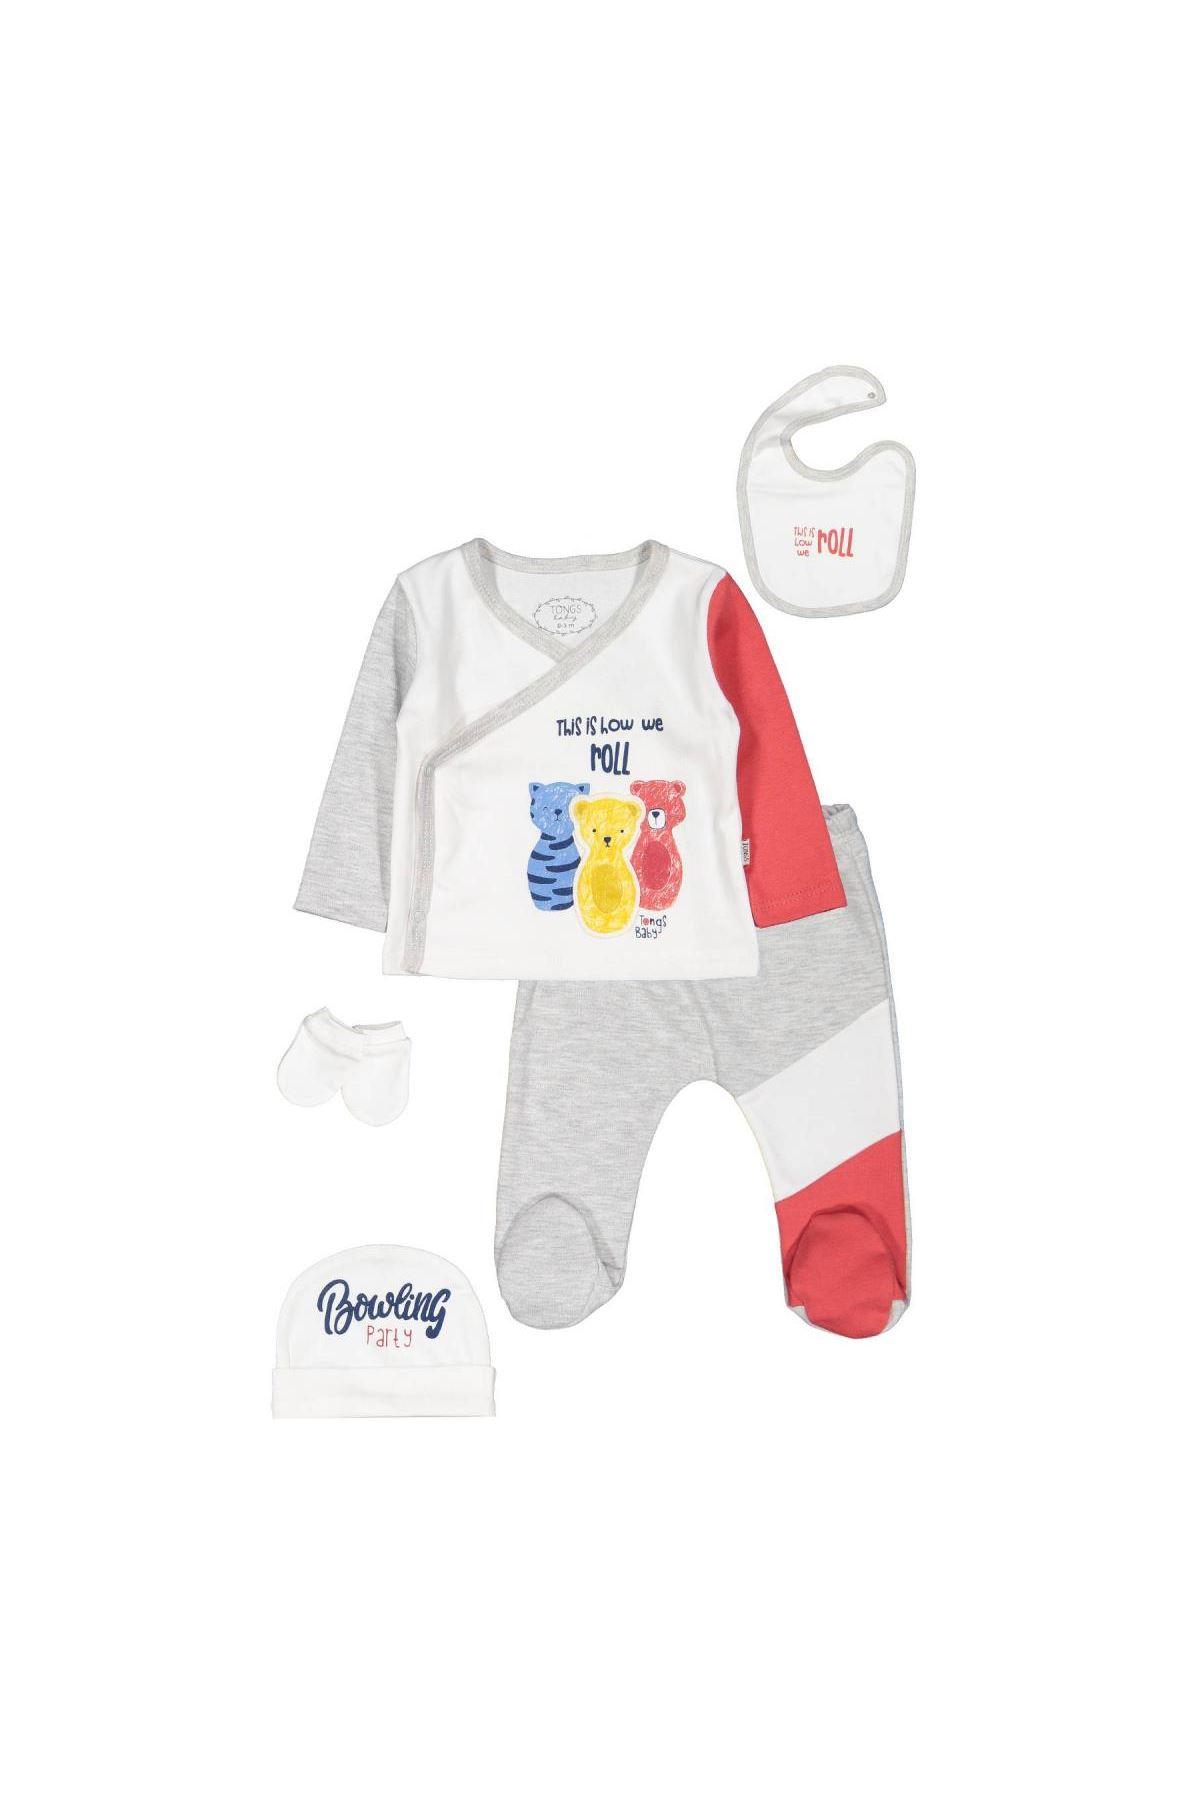 Tongs Baby Bowling Zıbın Set 2955 Kırmızı